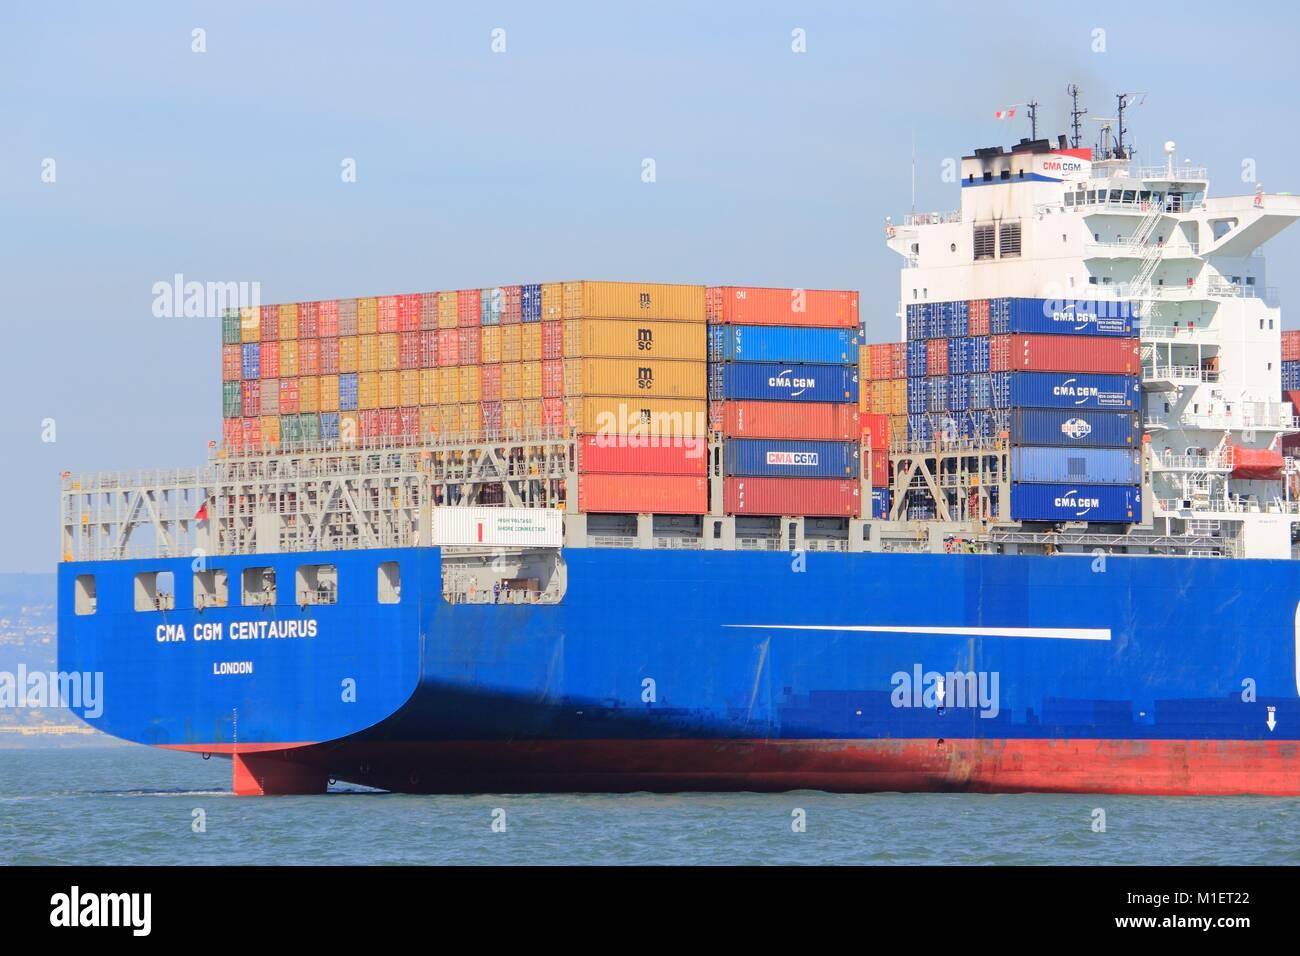 SAN FRANCISCO, USA - APRIL 8, 2014: CMA CGM Centaurius container ship sails in San Francisco bay. CMA CGM is the - Stock Image